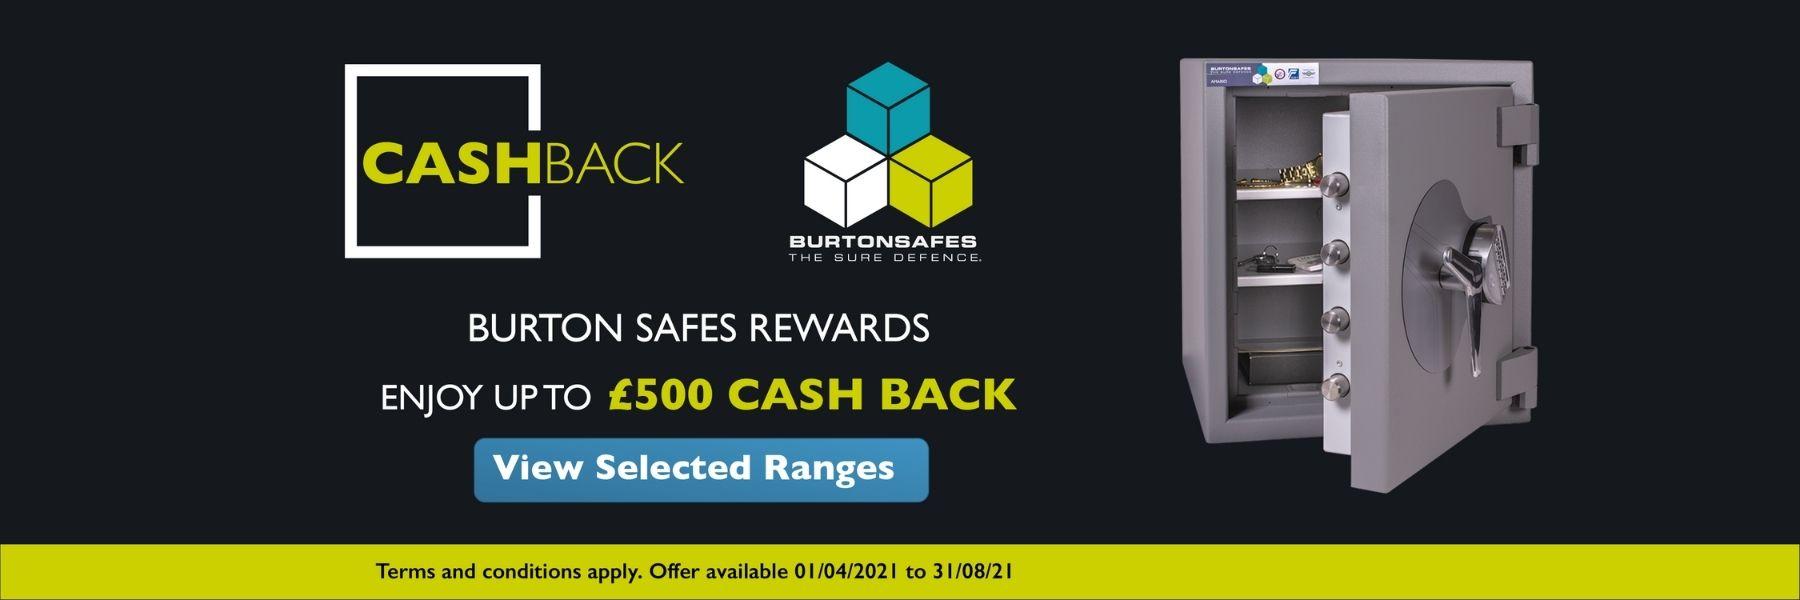 Barrington Security Partner with Burton Safes for Cash Back Promotion